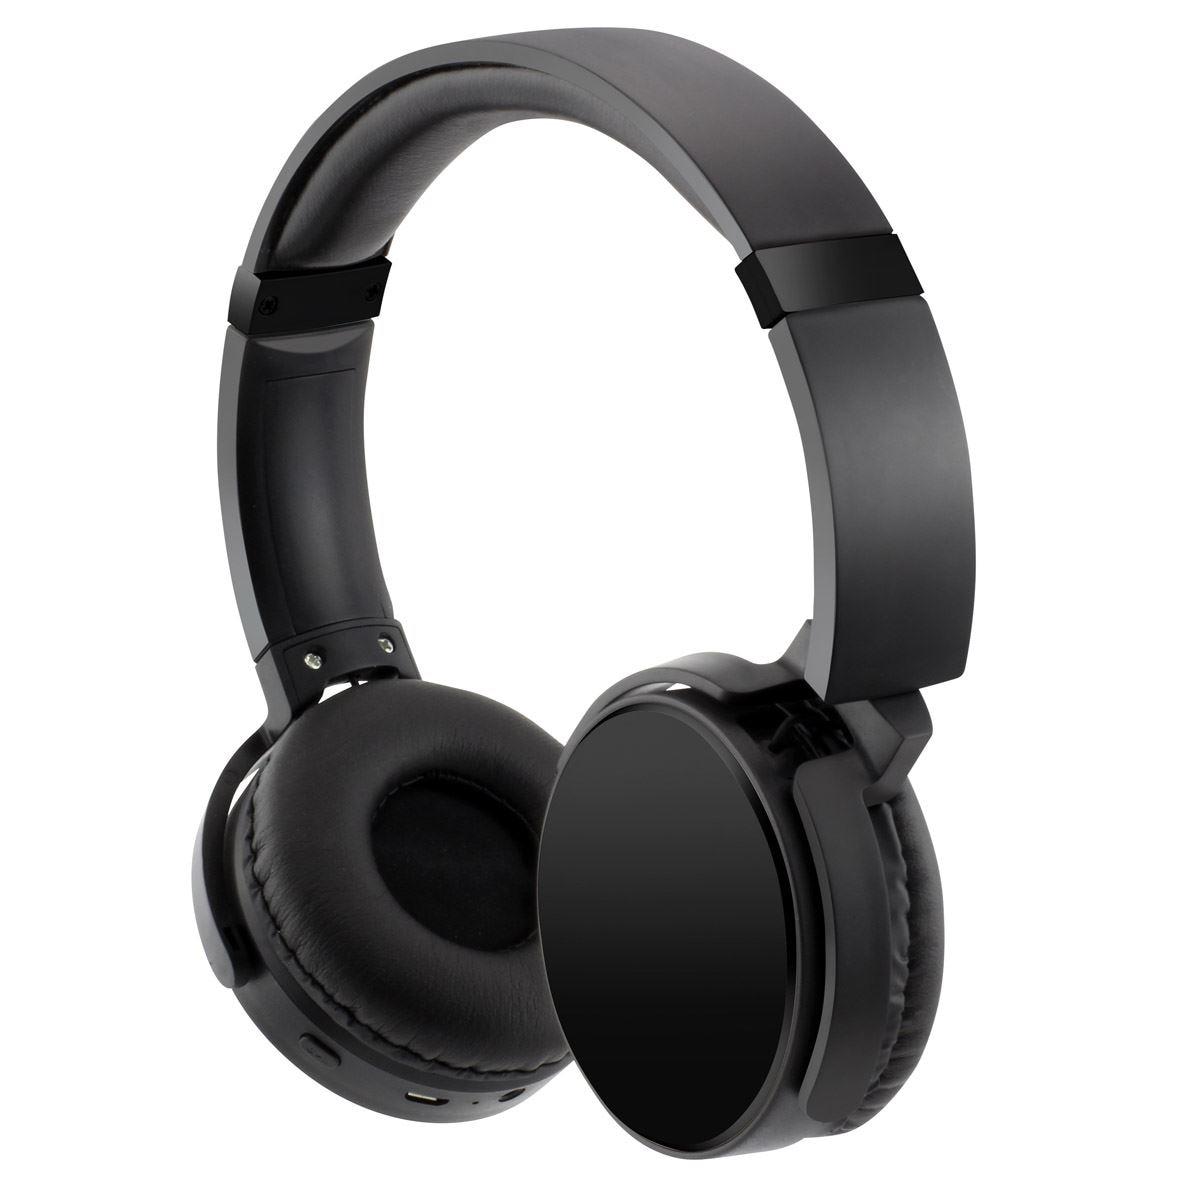 Audífonos de diadema bluetooth tipo dj onyx  - Sanborns